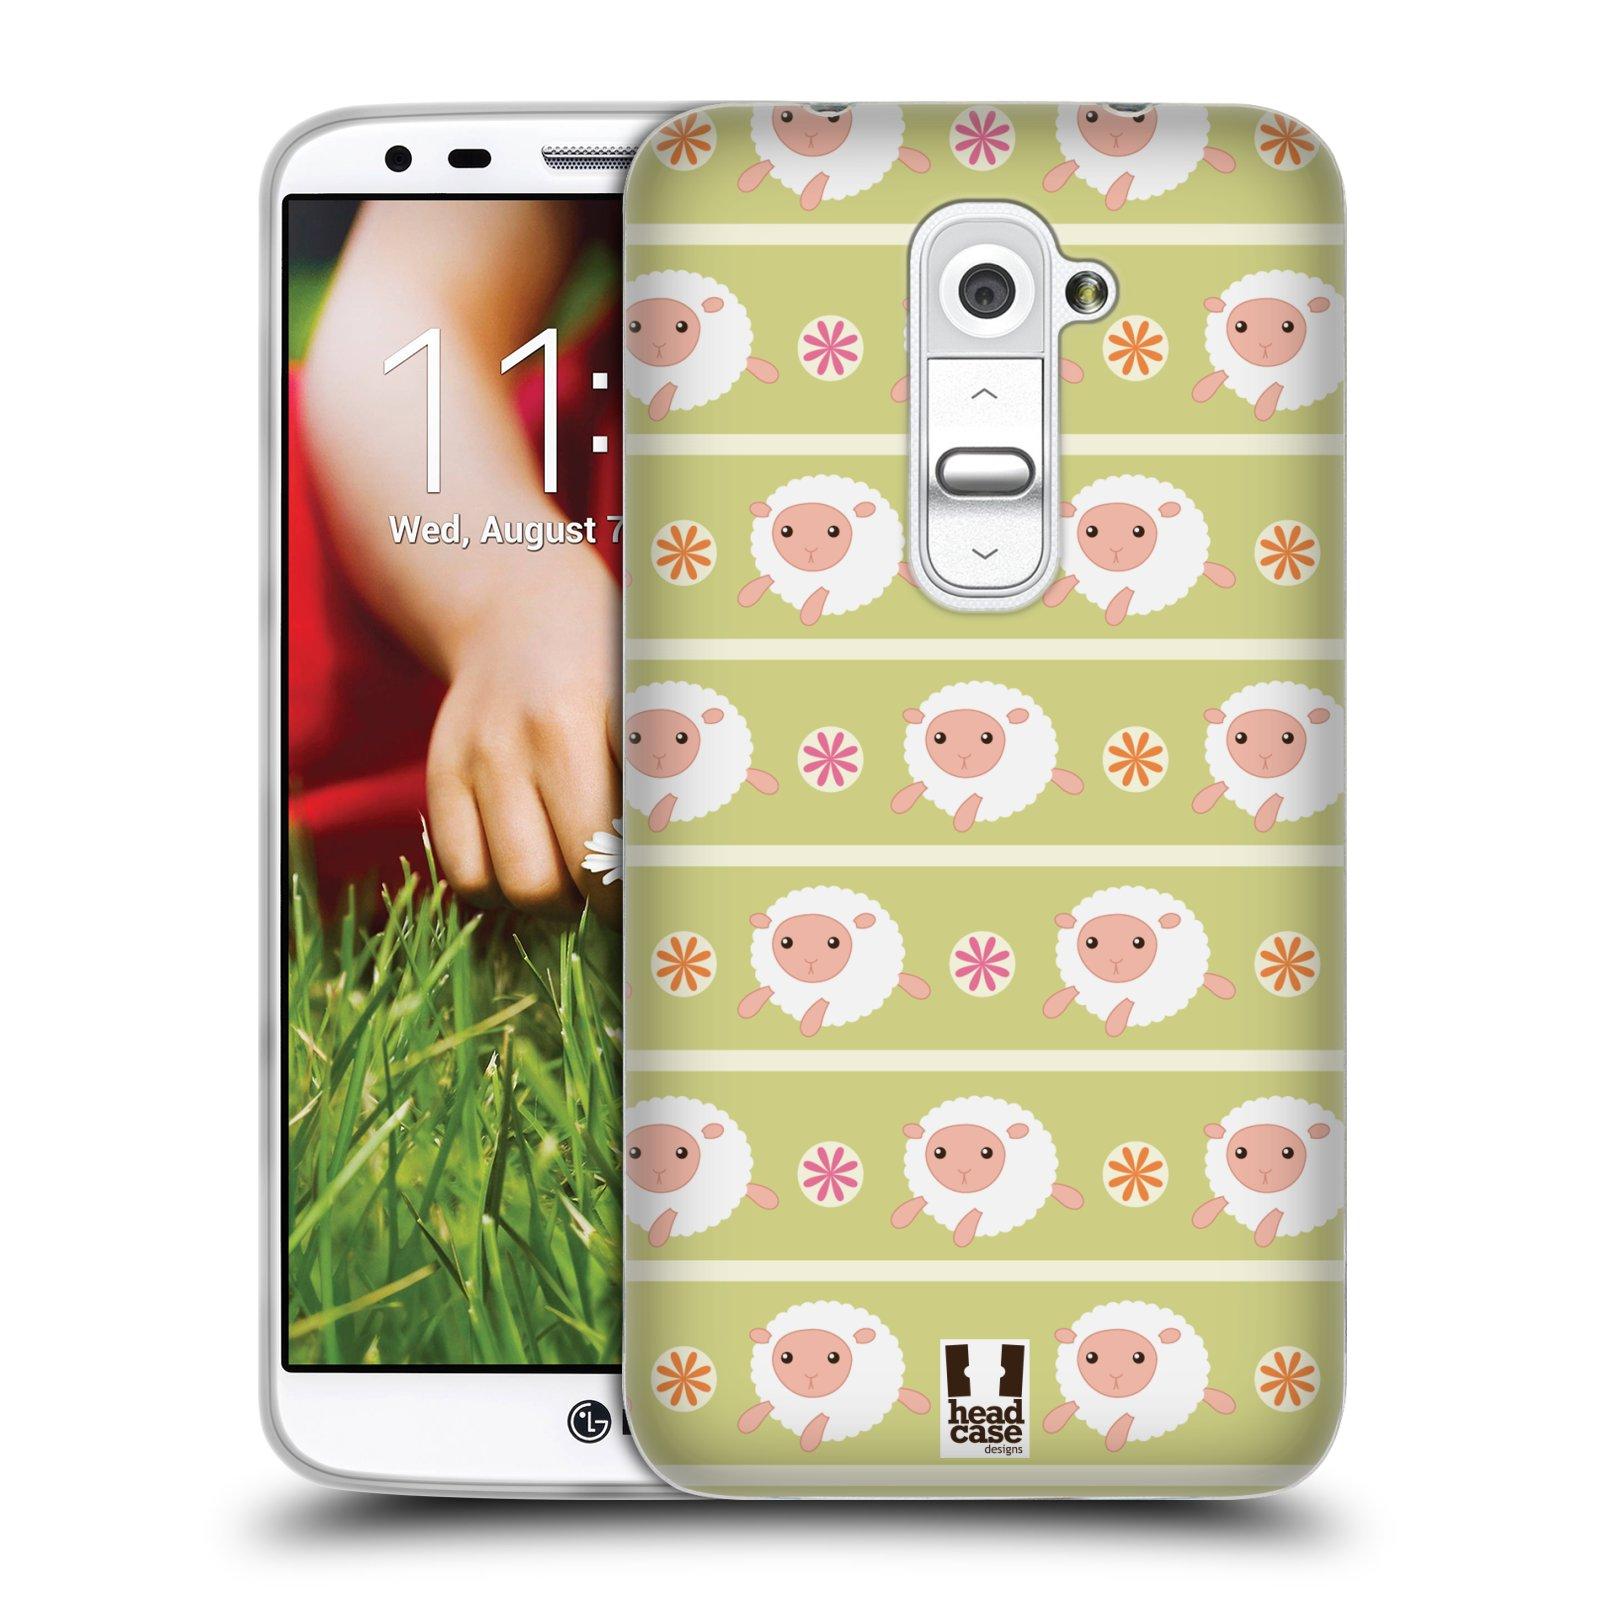 HEAD CASE silikonový obal na mobil LG G2 vzor roztomilé zvířecí vzory ovečky